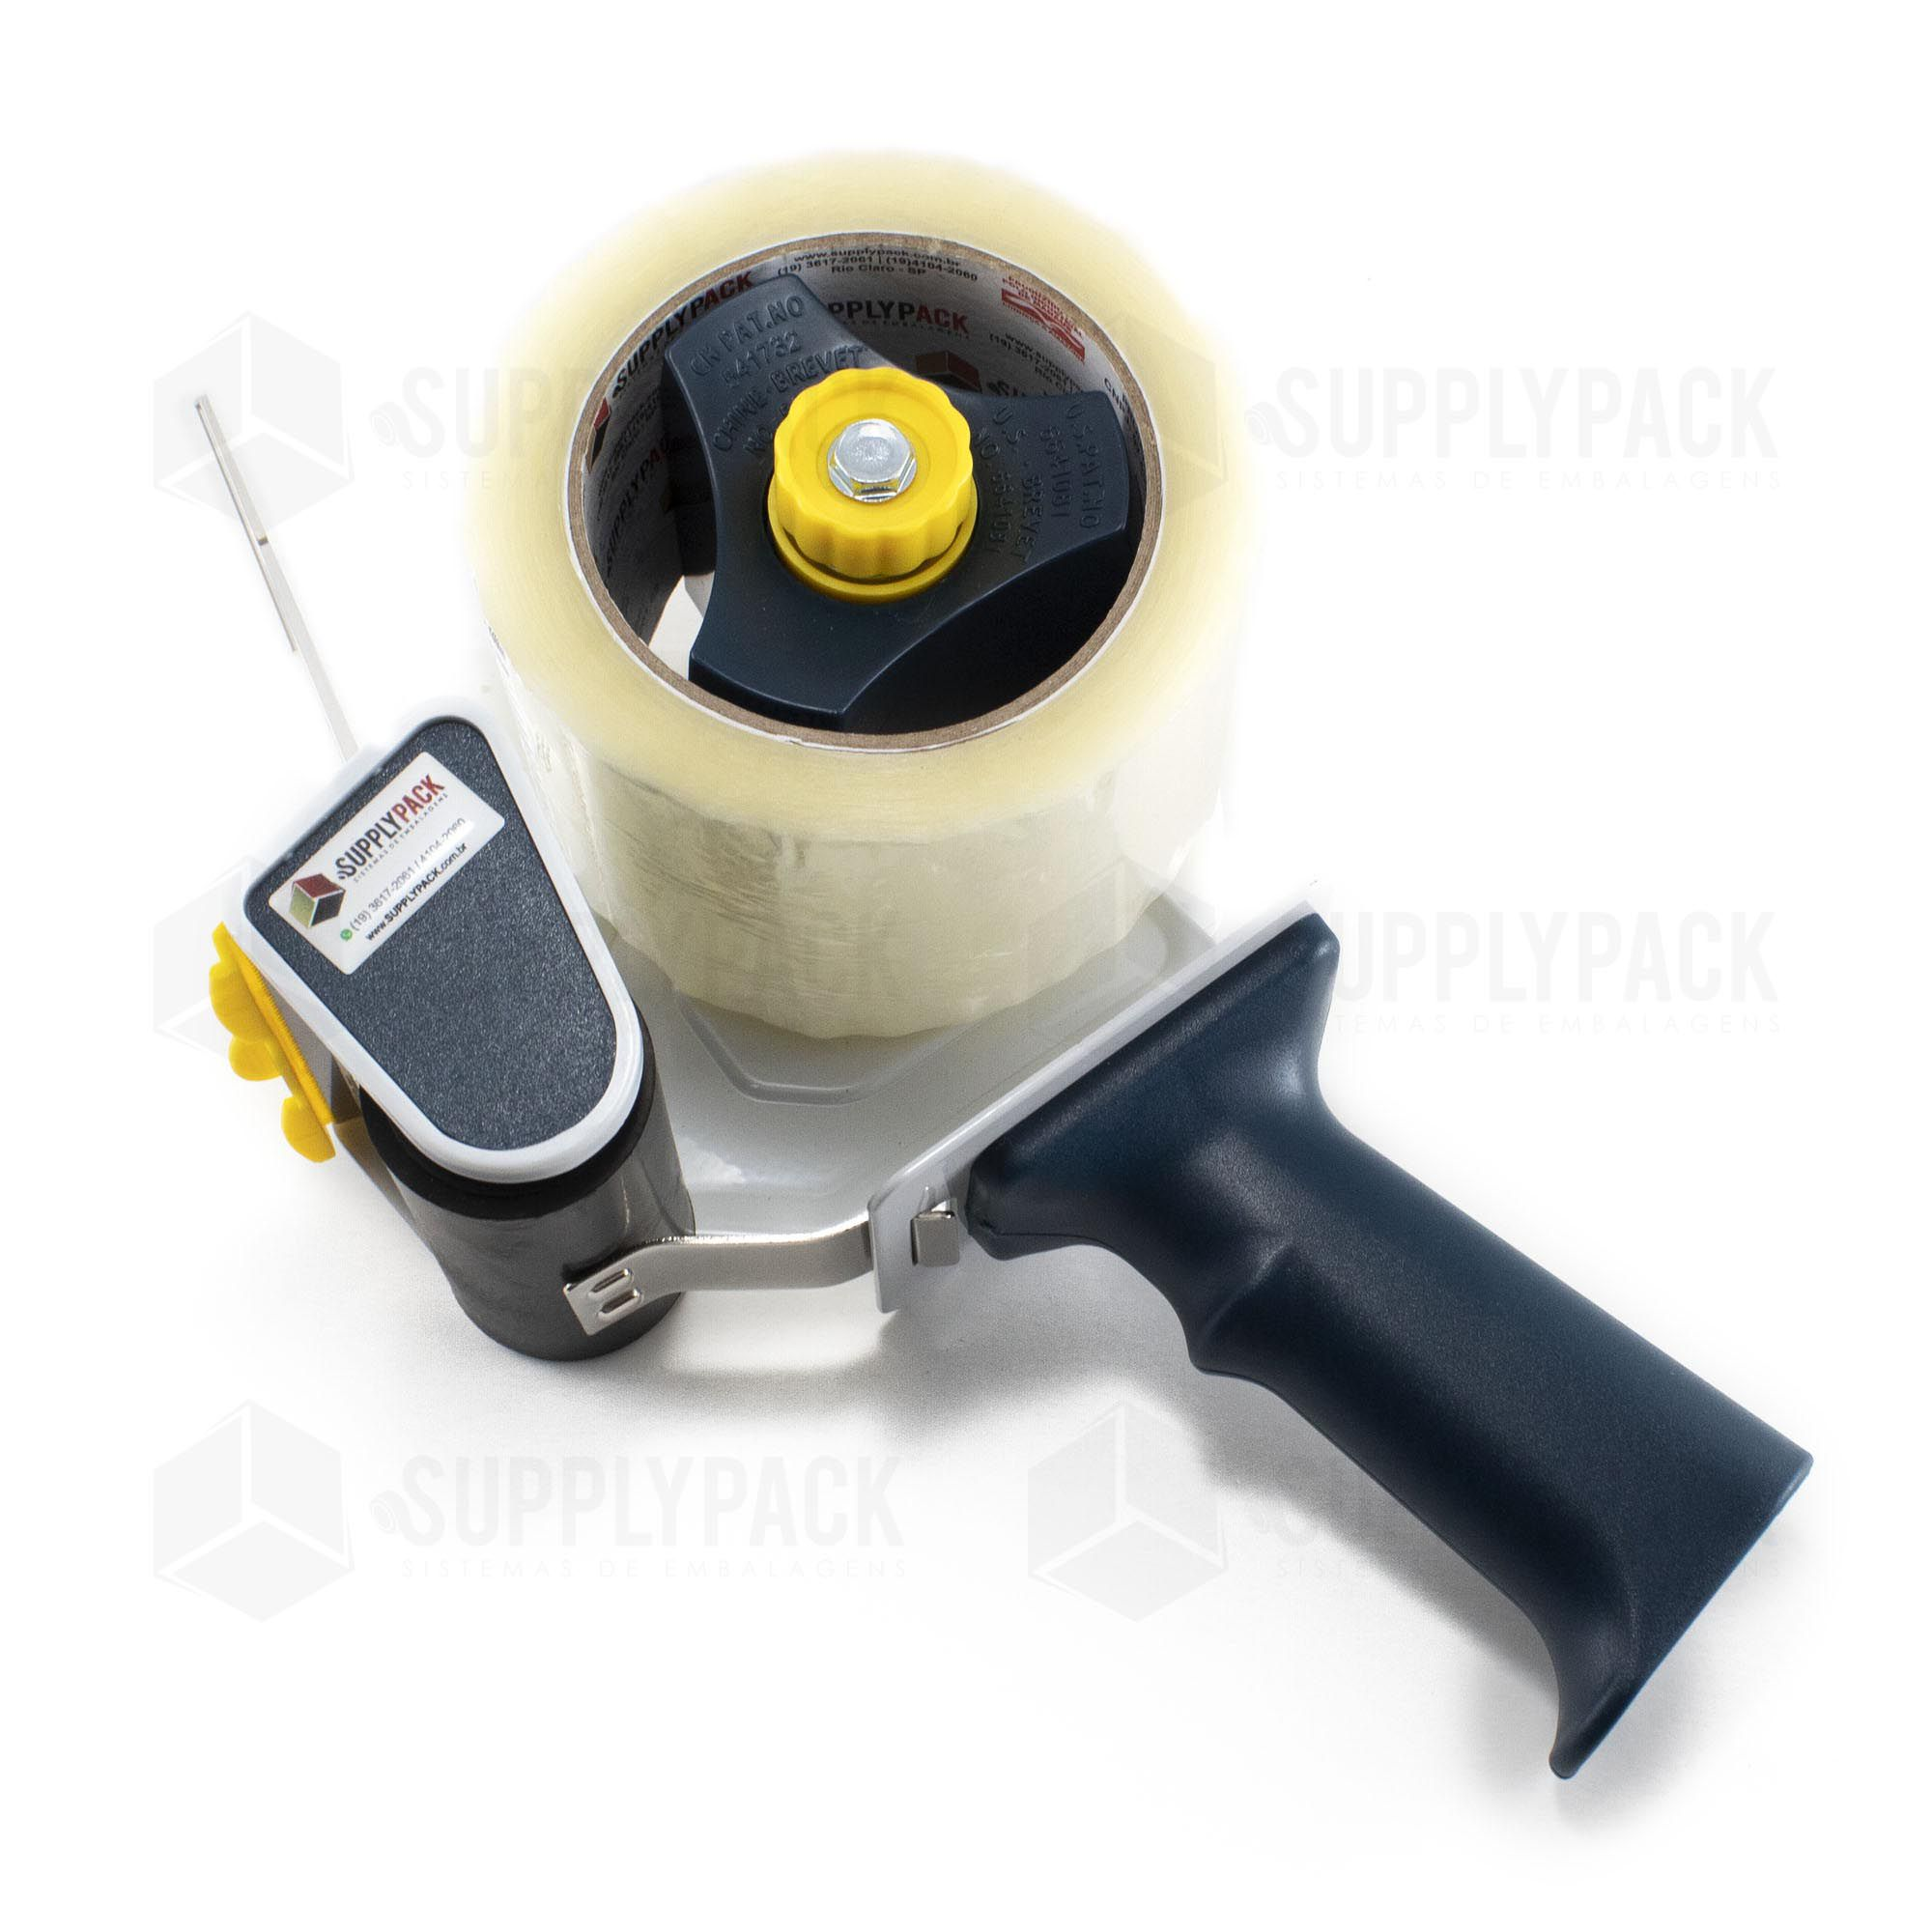 Aplicador Dispensador Manual de Fita Adesiva 70 MM Supplypack